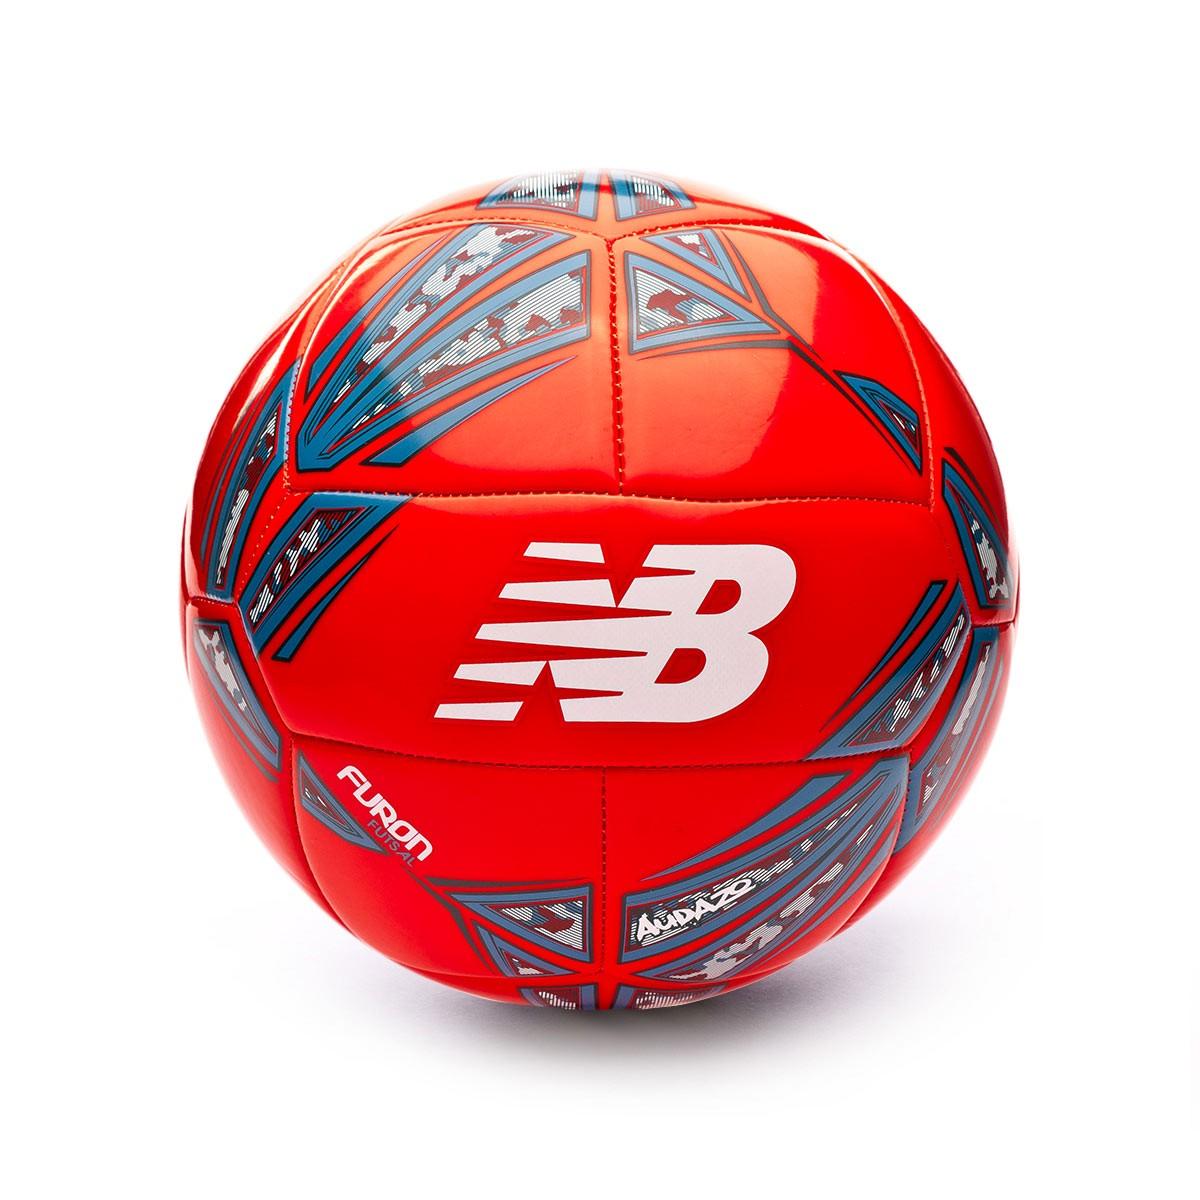 Ball Balance Season Java Game: Tienda De Fútbol Fútbol Emotion